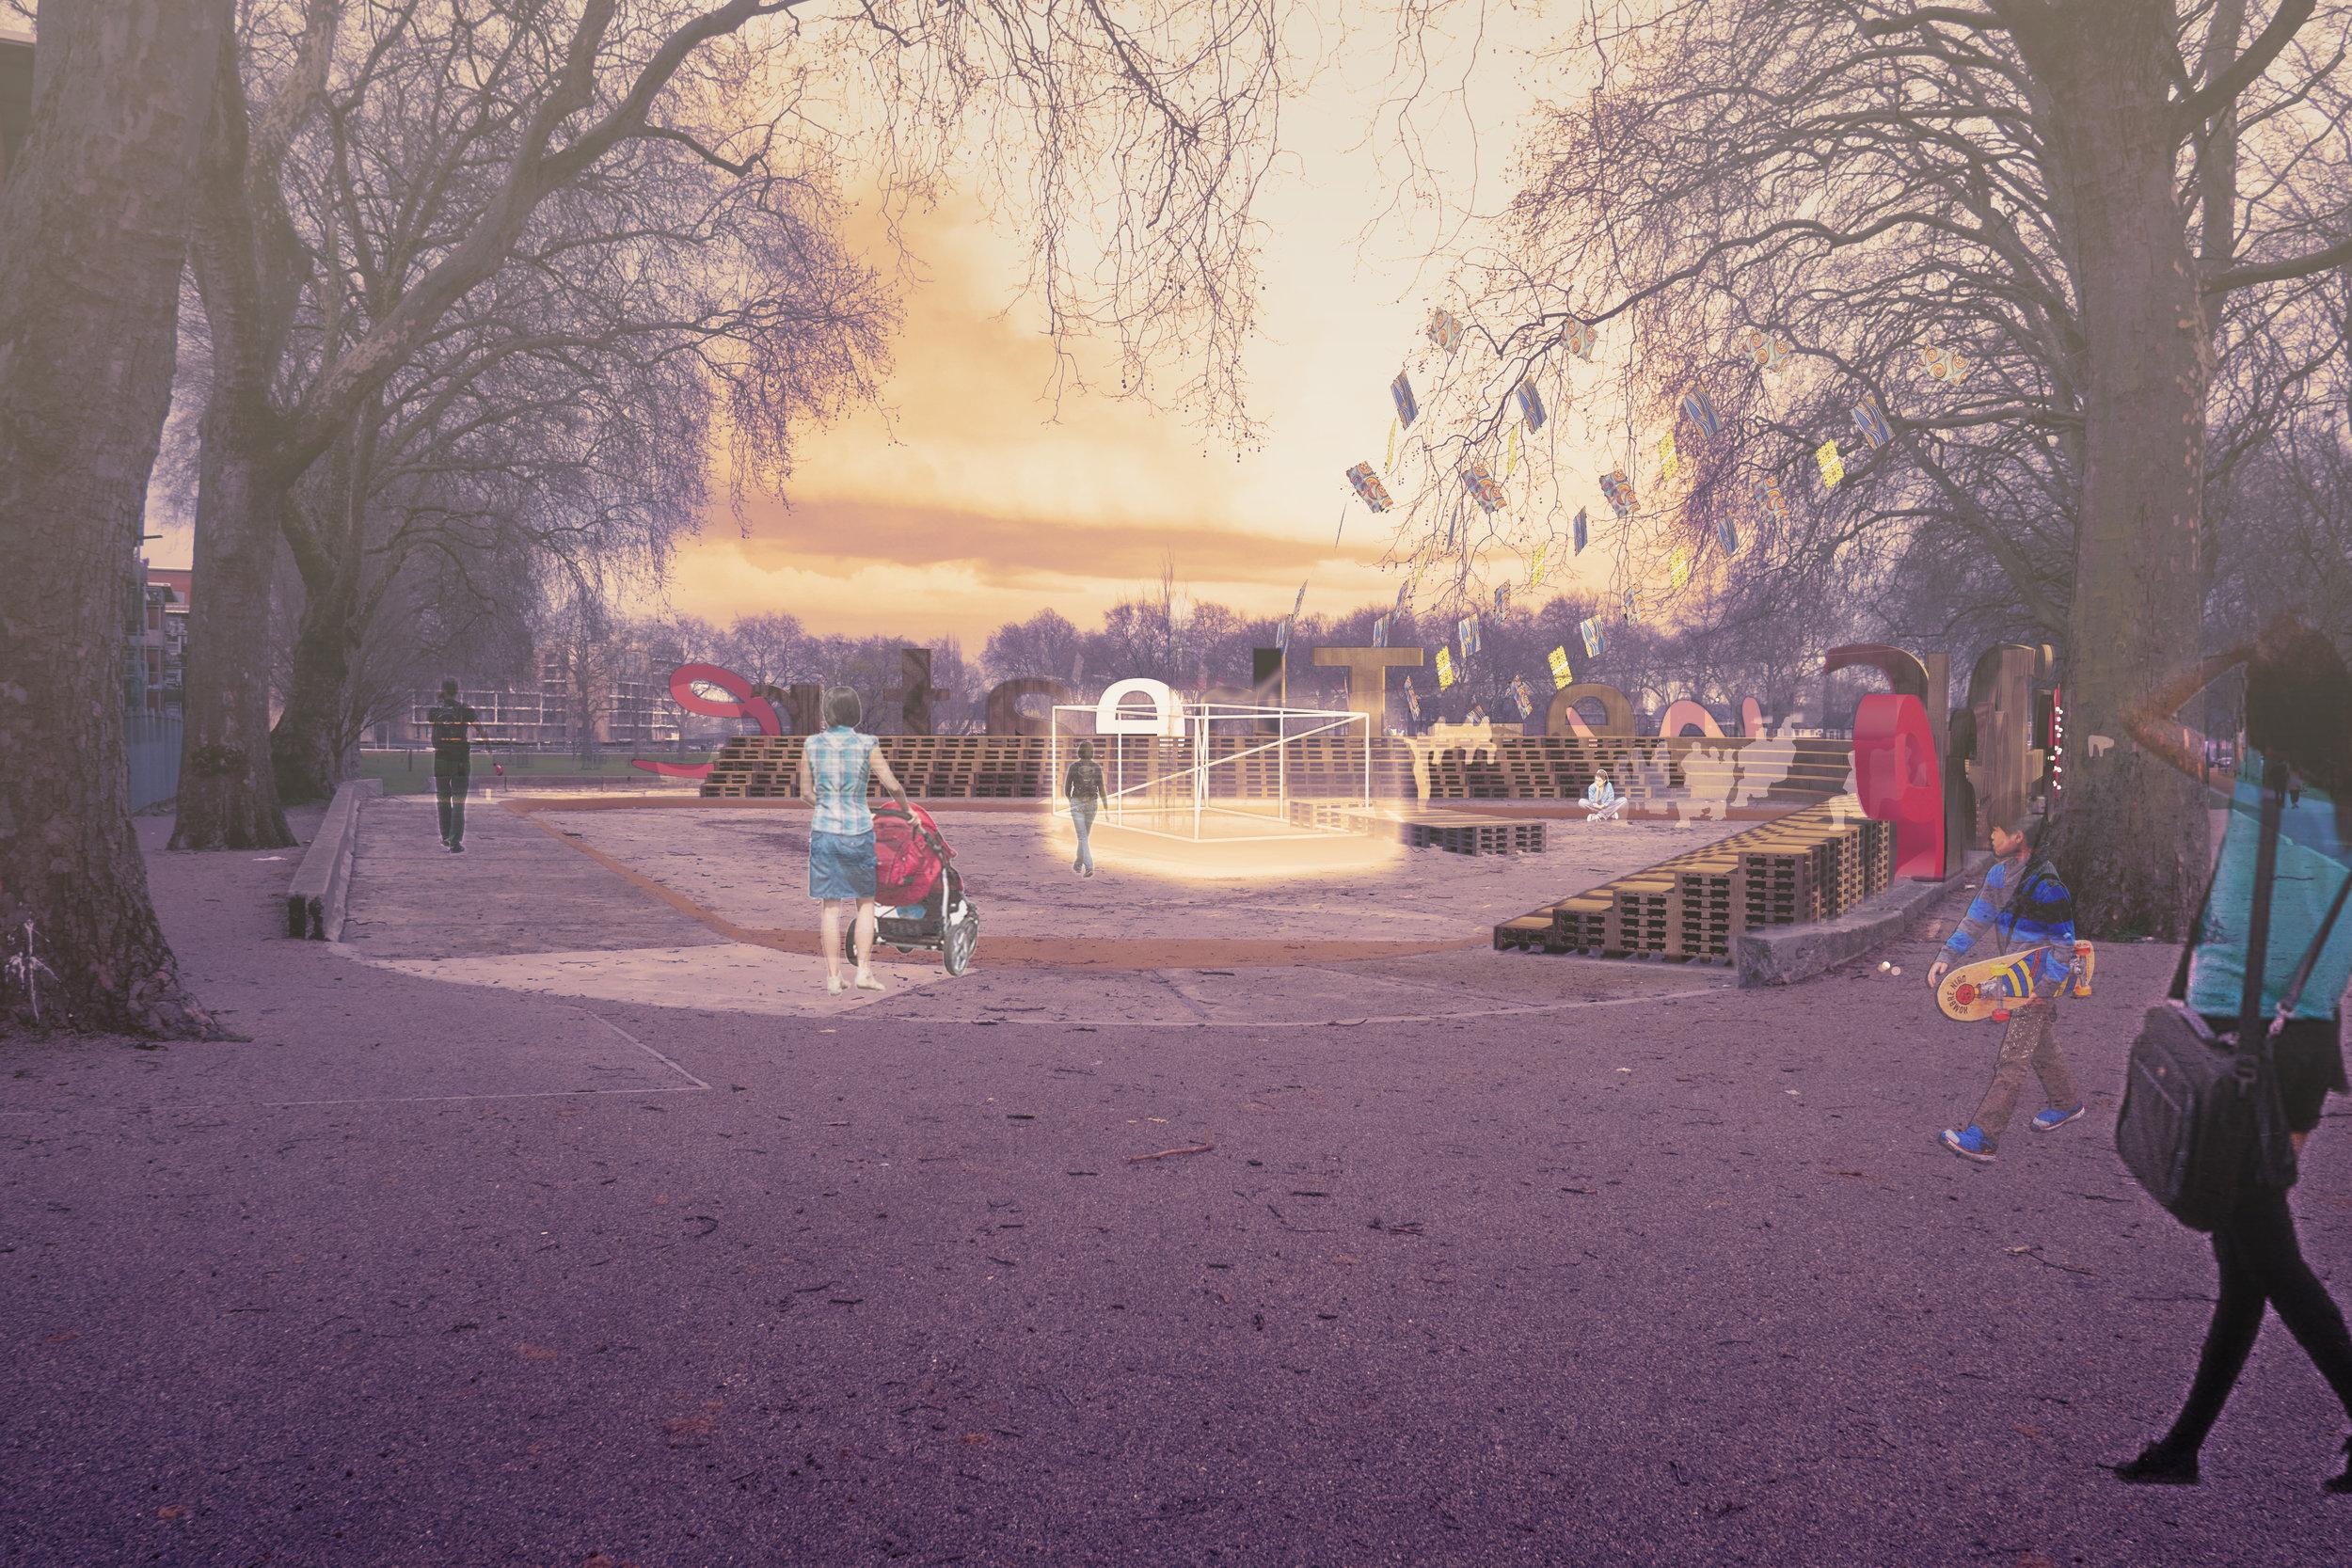 Cine - Theatre Concept Image - Twilight